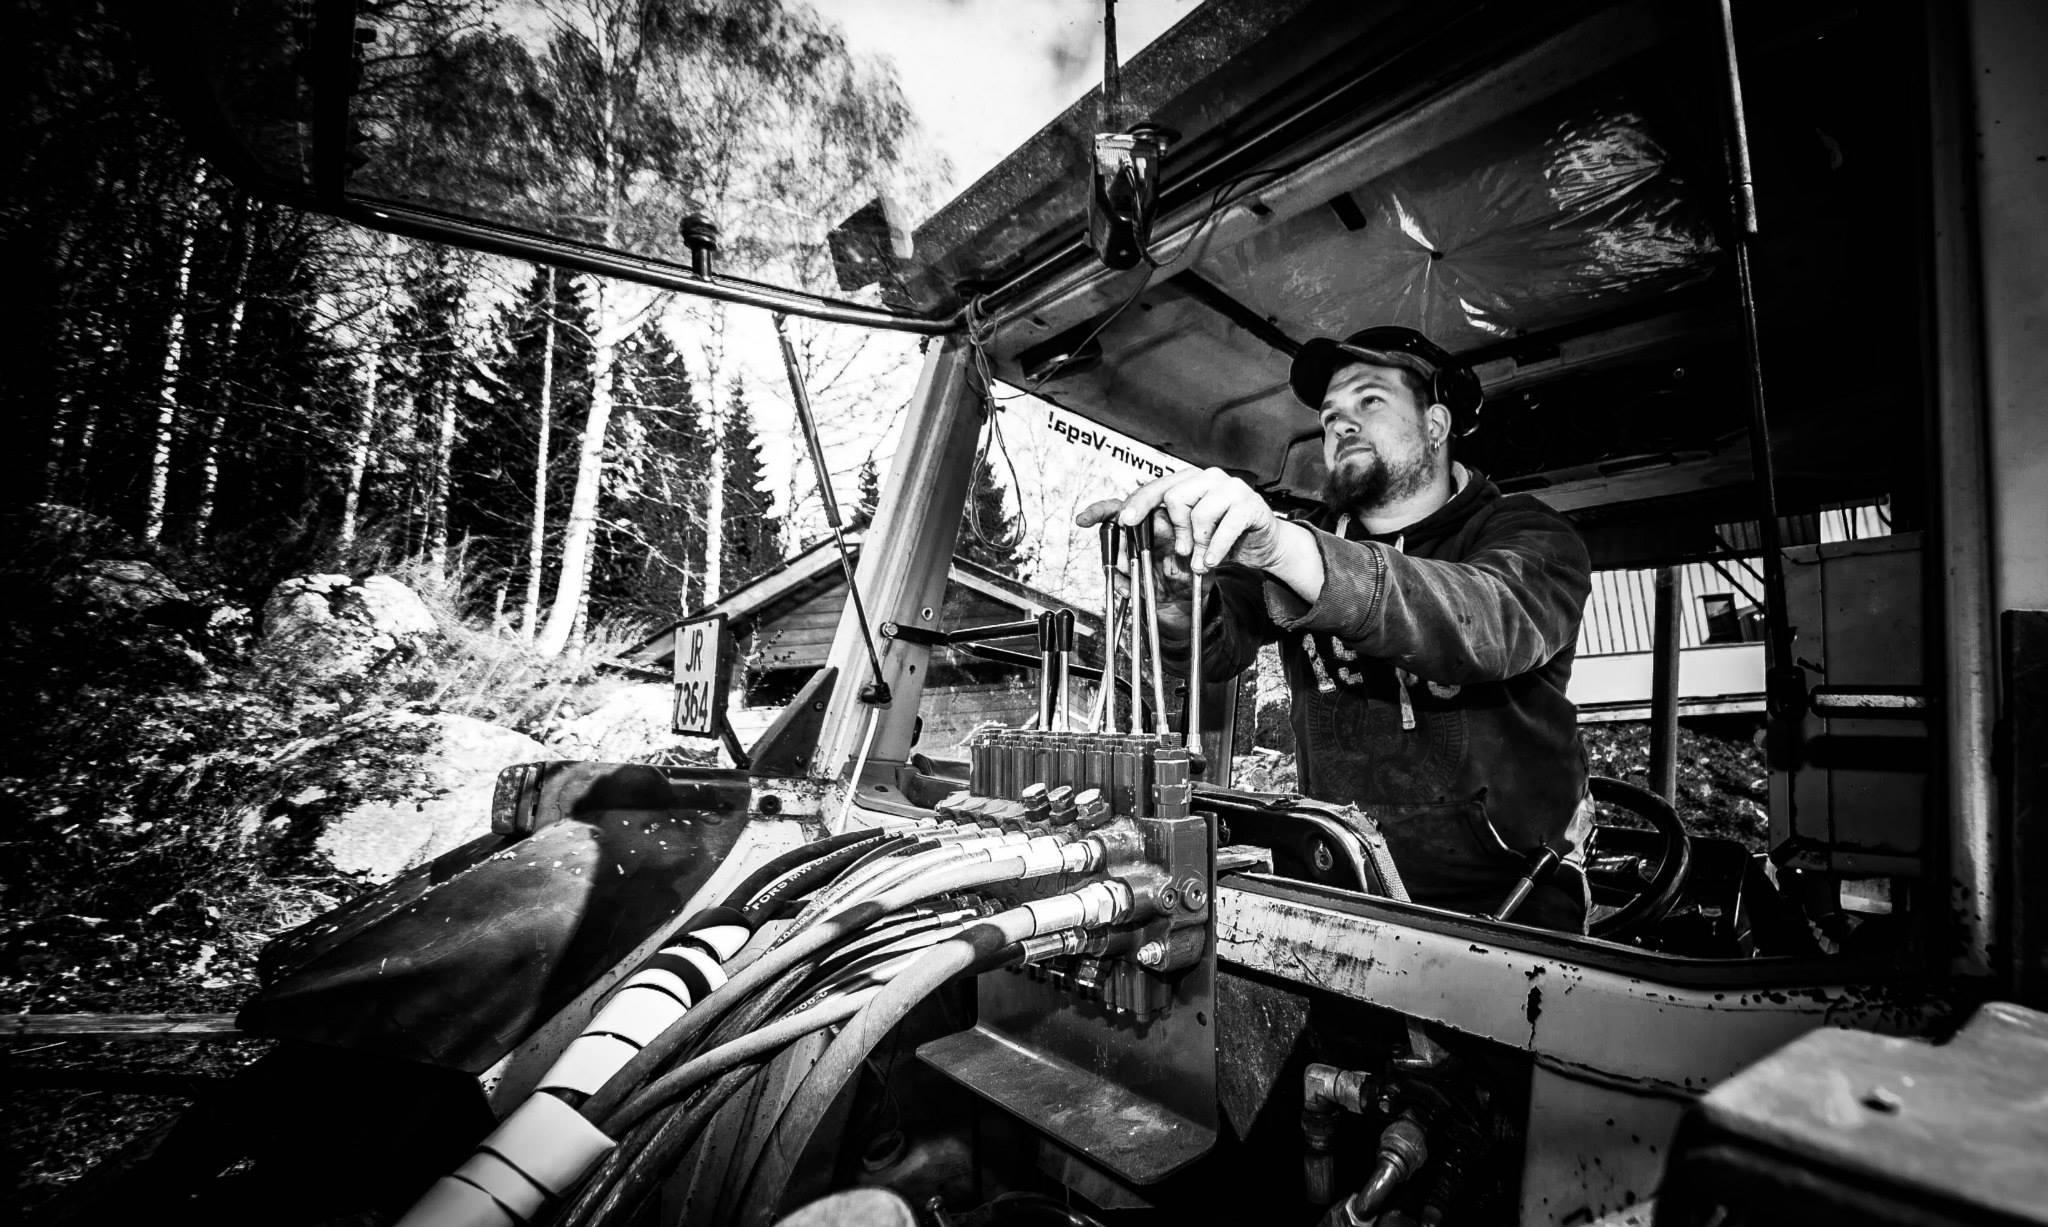 Jon Gudbrand bak spakene(Vegardfoto)